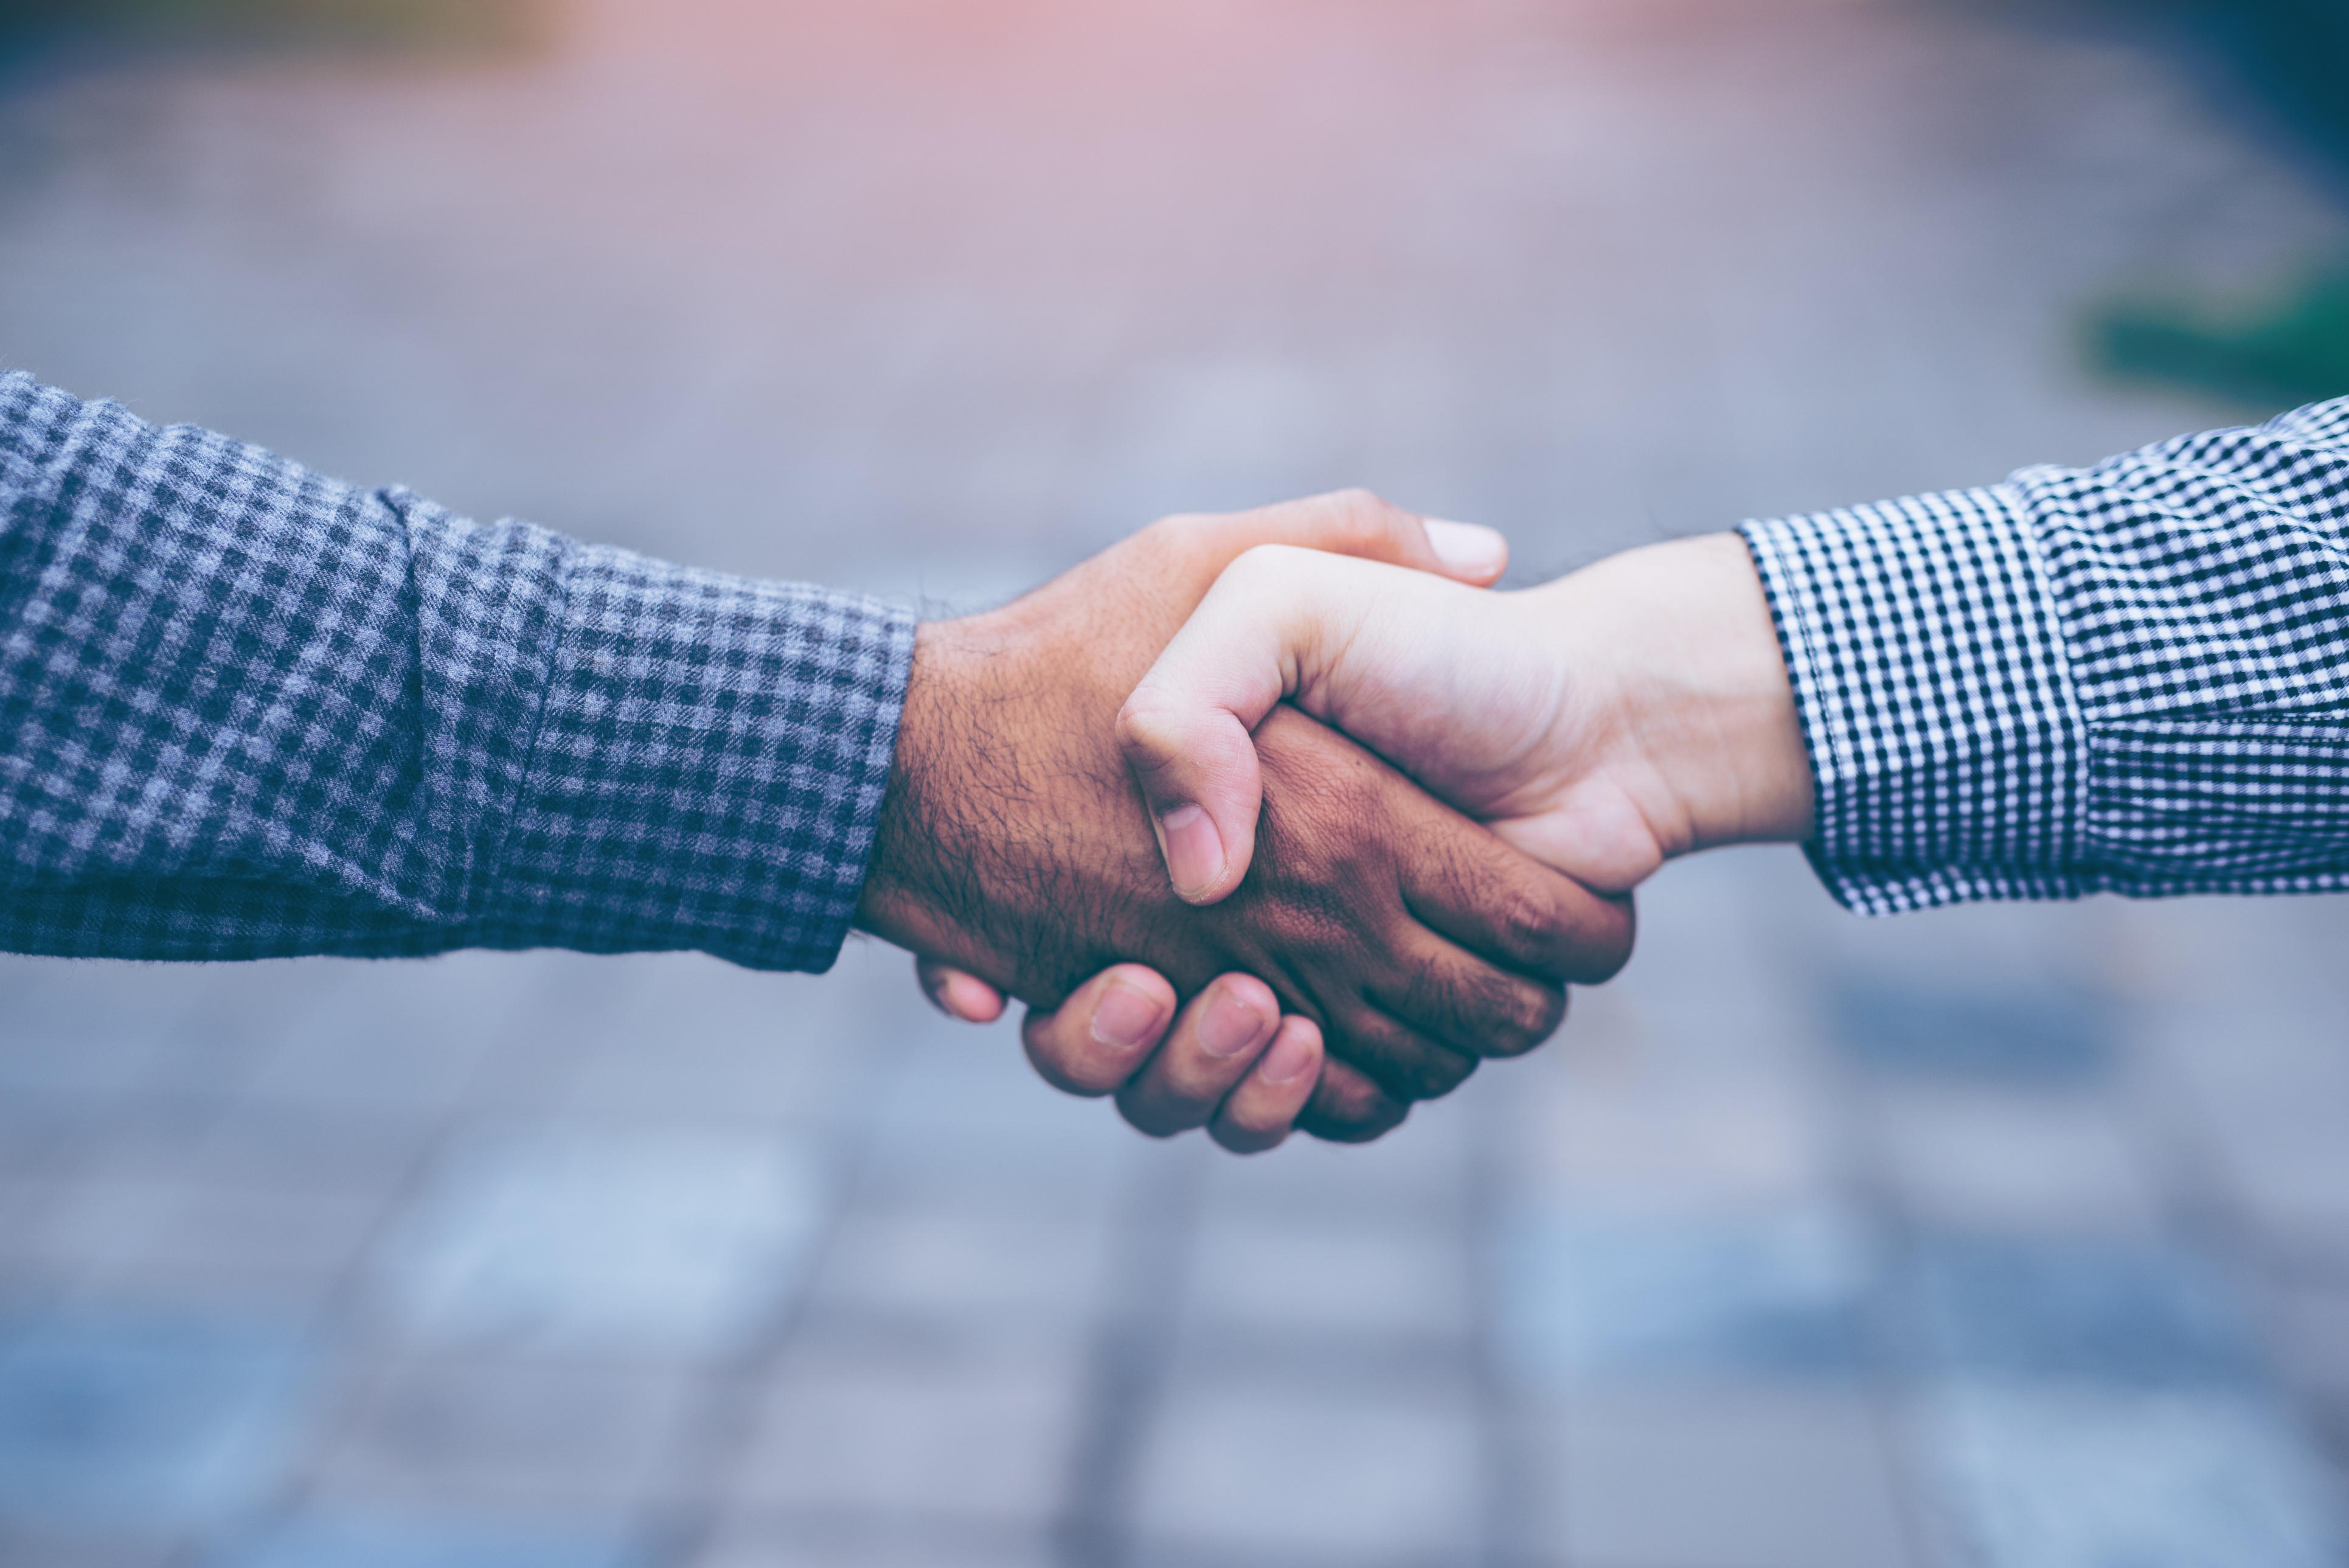 two-men-shaking-hands.jpg